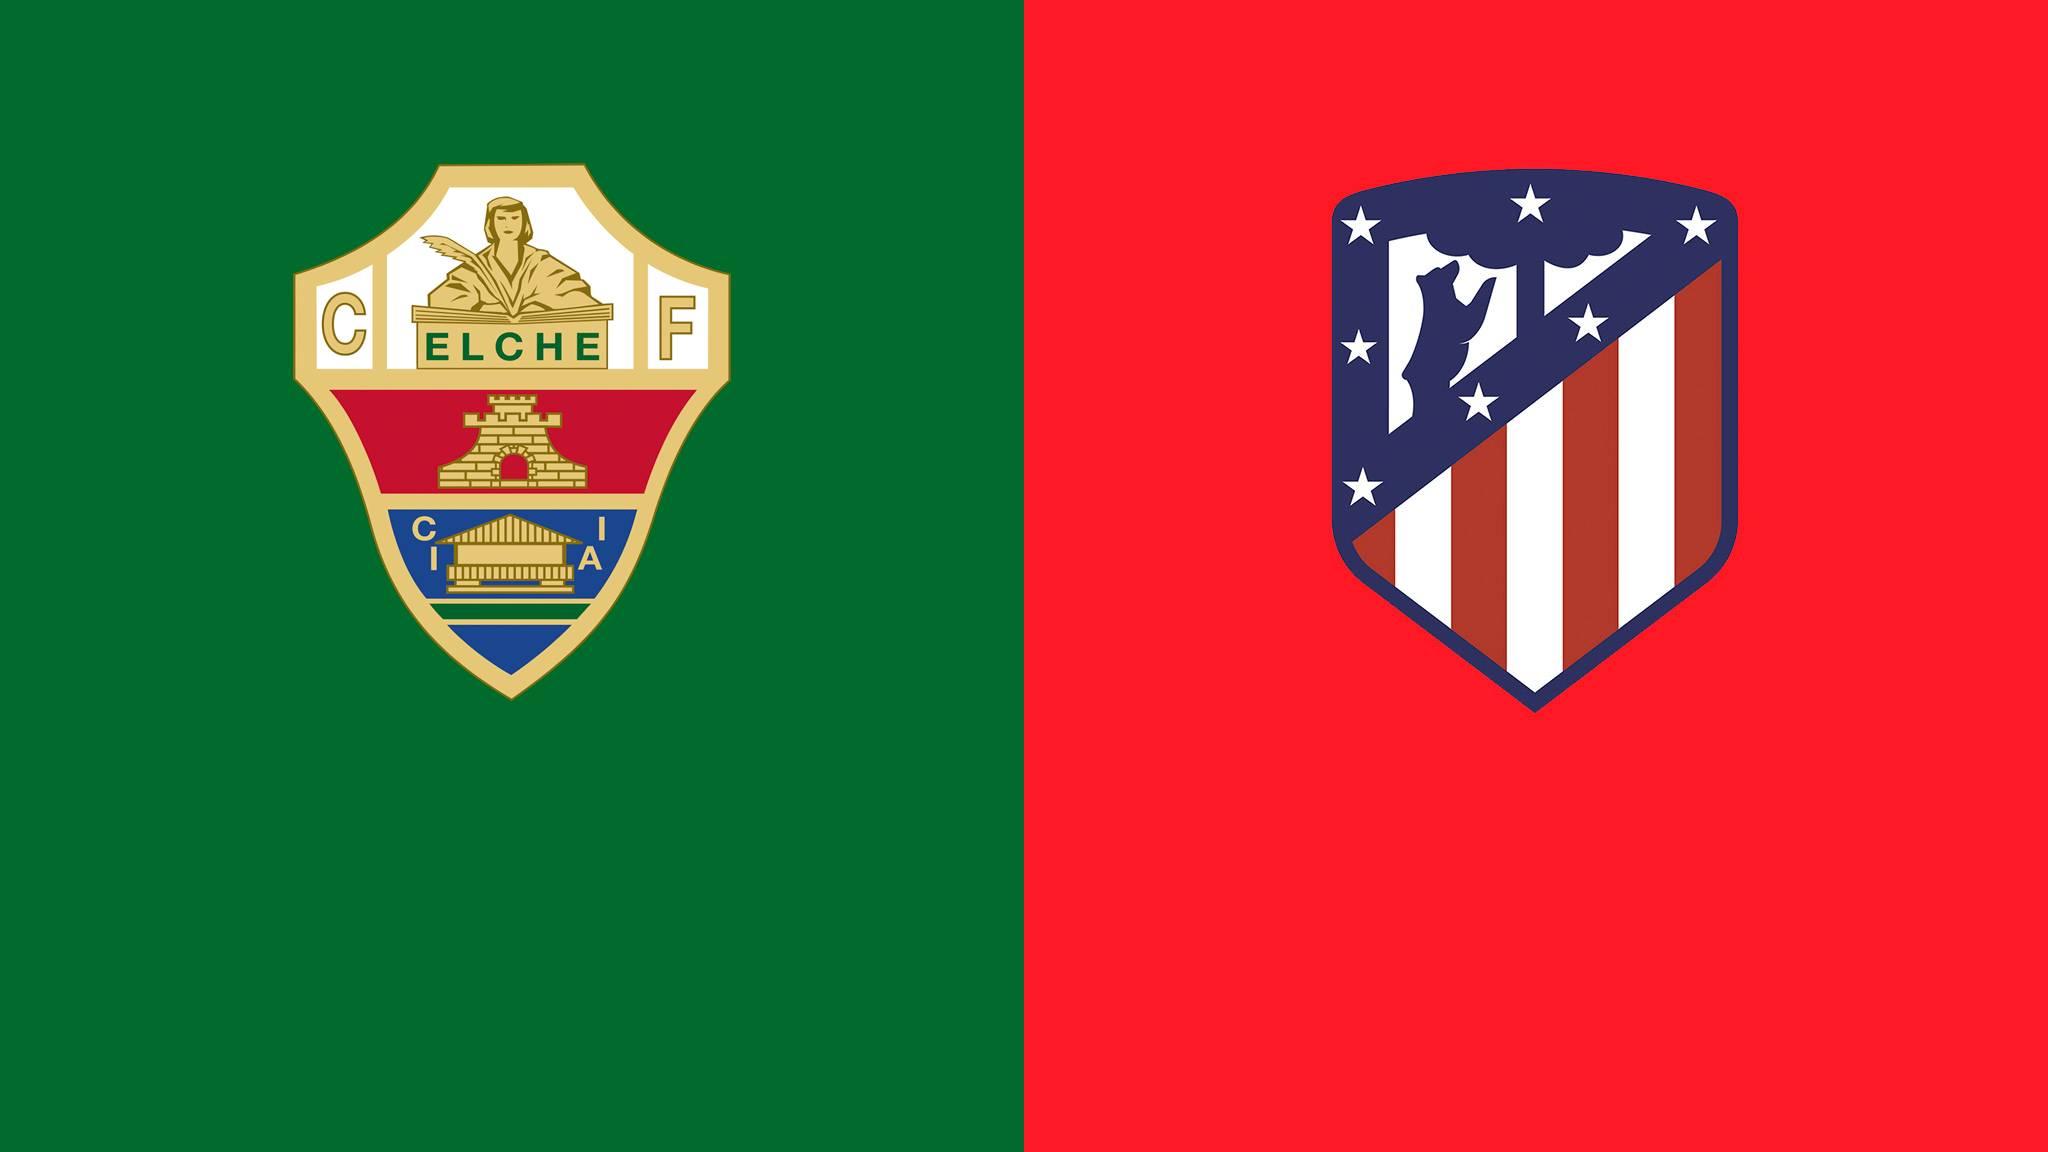 Elche - Atletico Madrid Live Stream   Gratismonat Starten